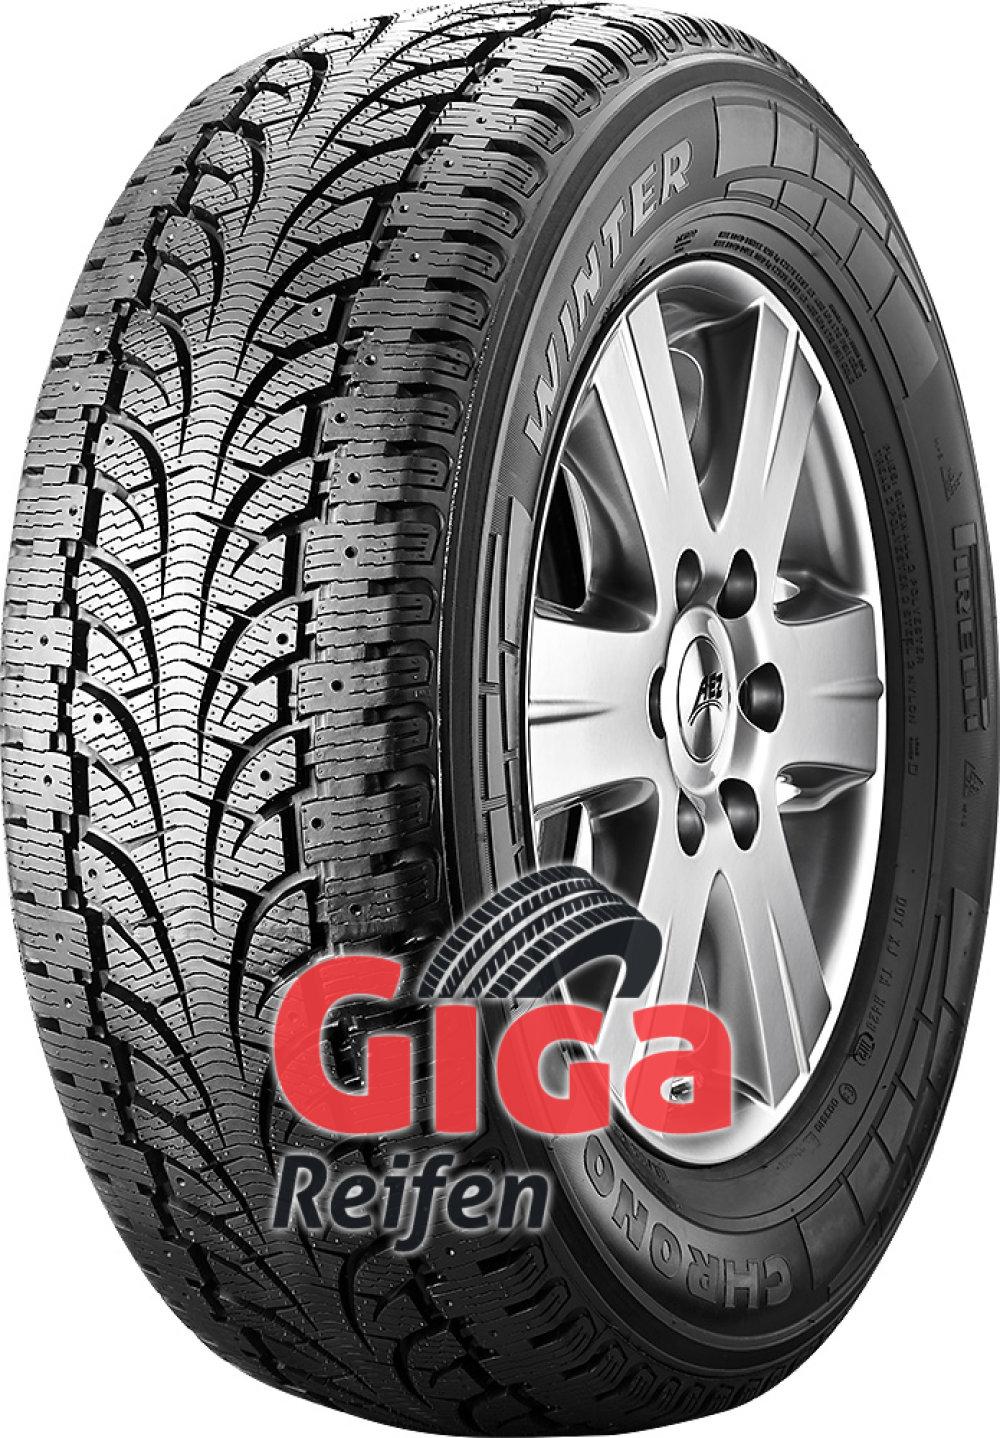 Pirelli Chrono Winter ( 205/70 R15C 106/104R )